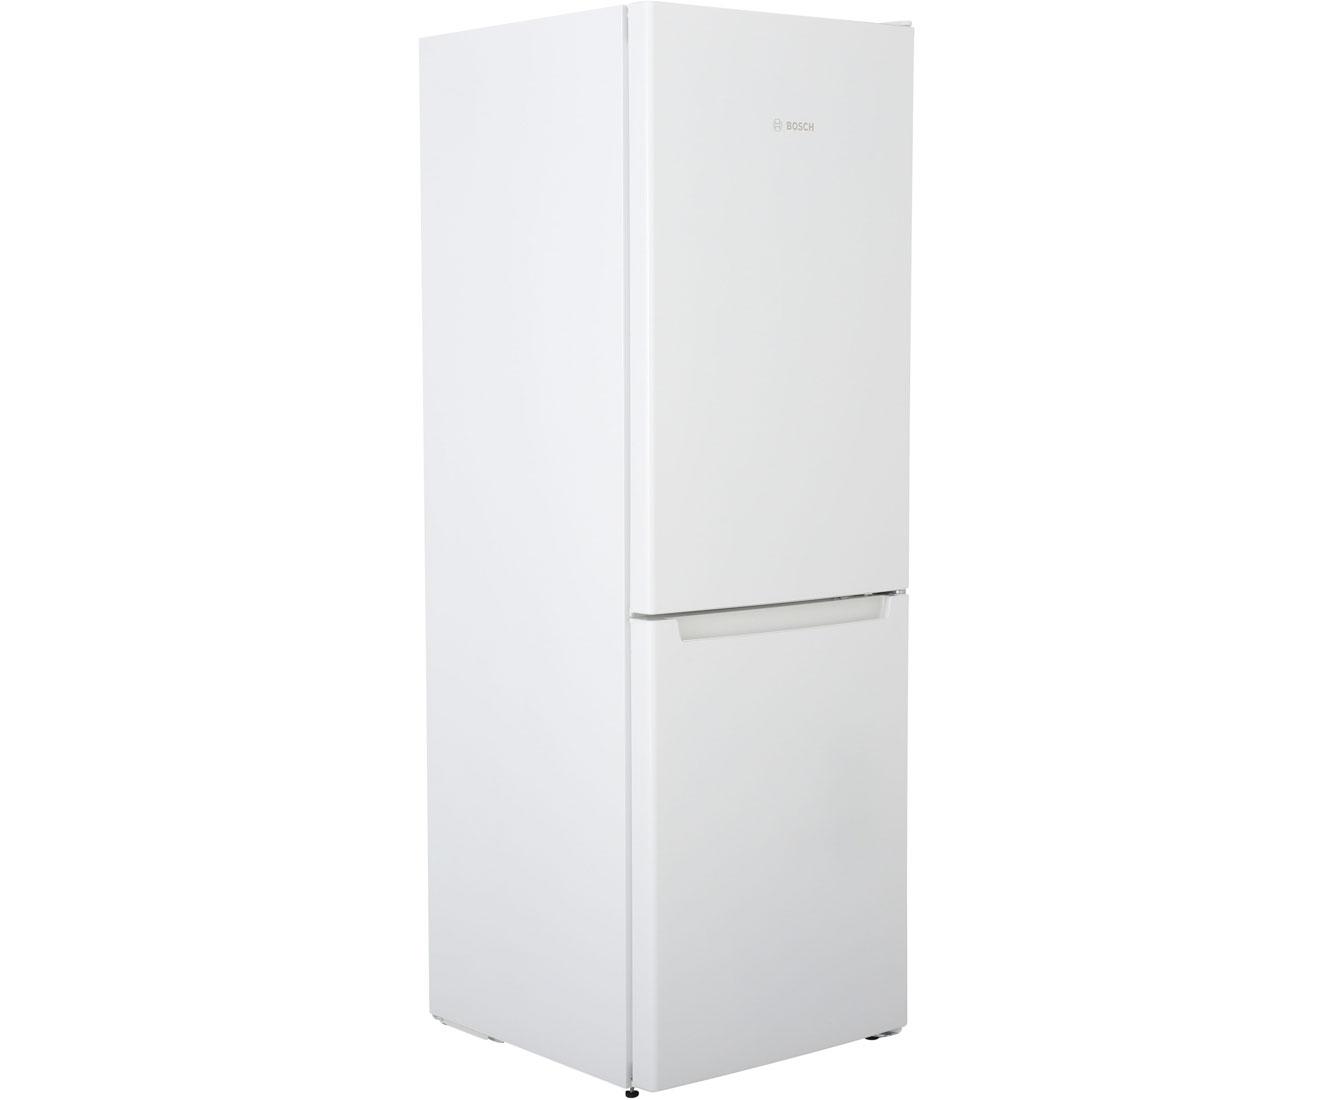 Mini Kühlschrank Poco : Amica kühlschrank poco weiße küchen mit wohnkonfetti avec ikea